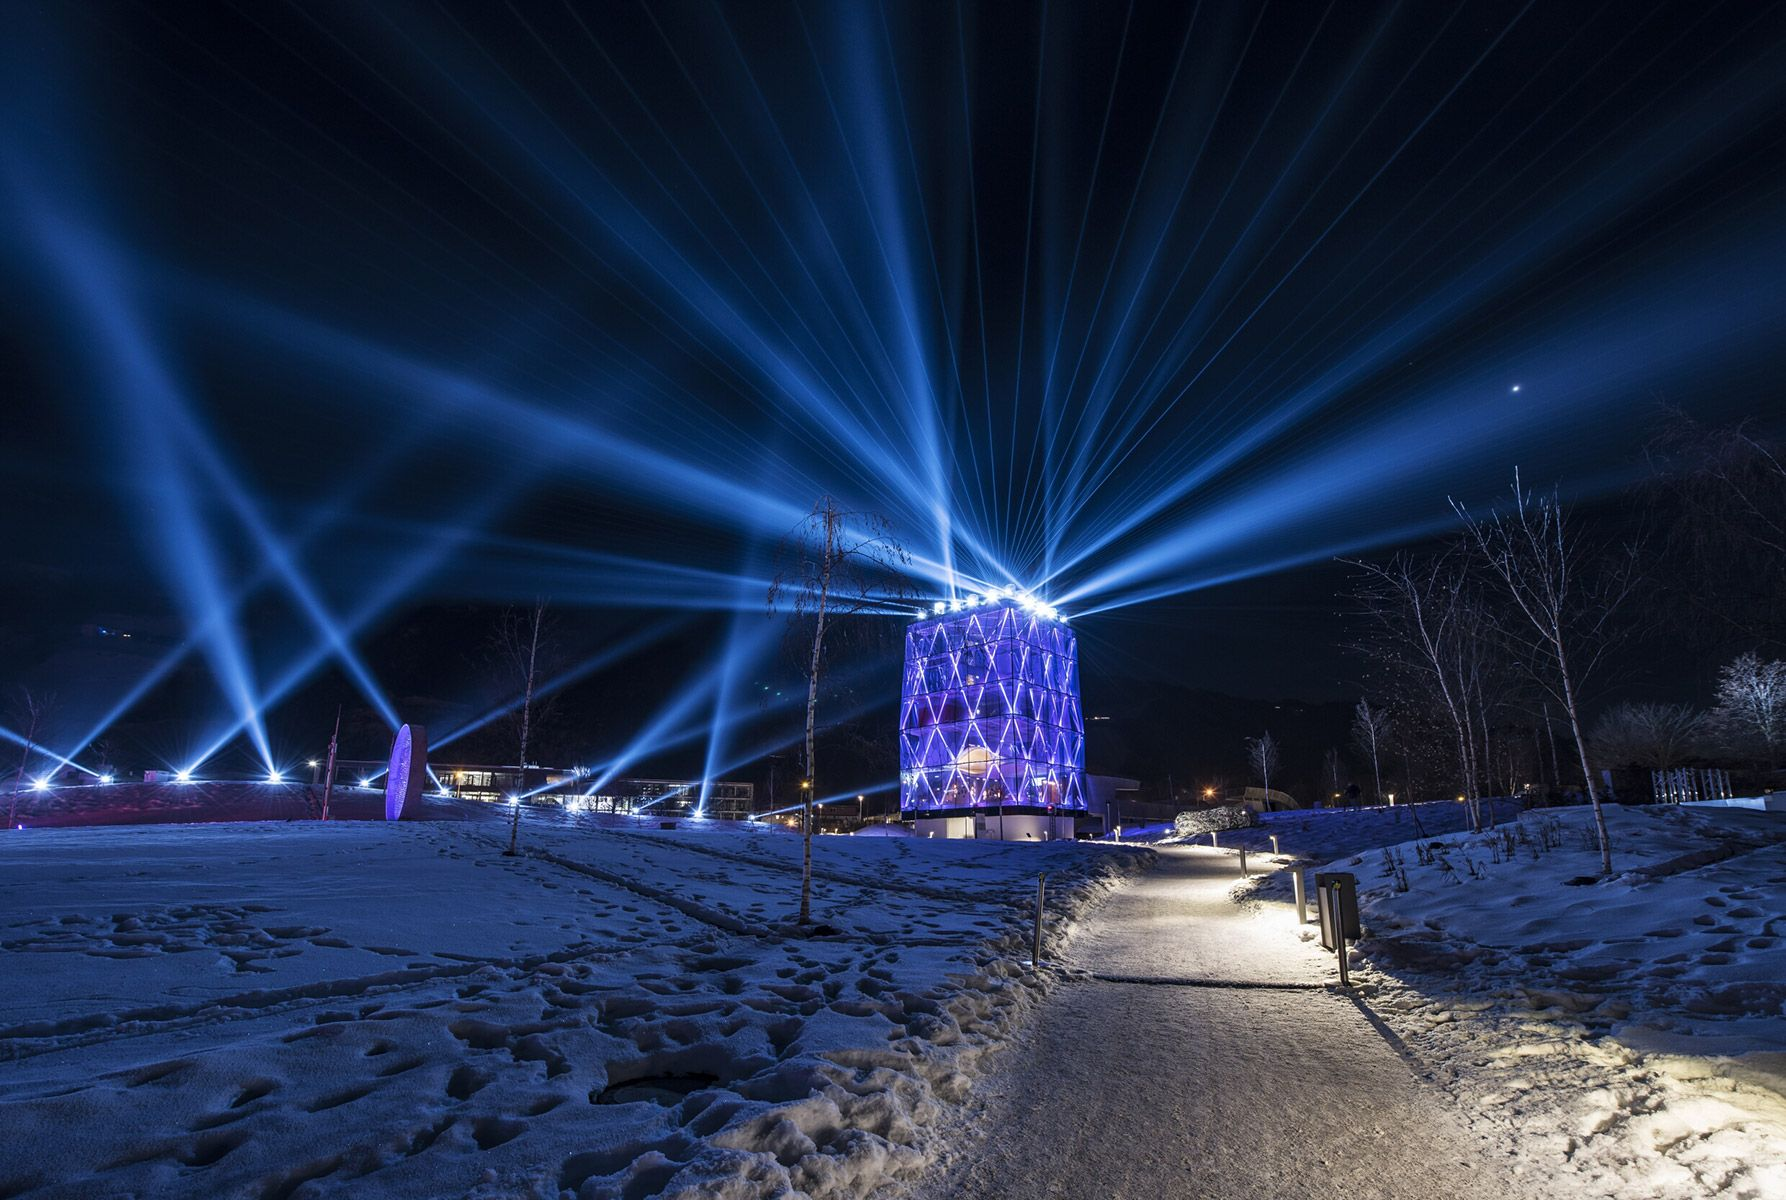 c1e02ee18555da The Festival of Light at Swarovski Kristallwelten in Wattens